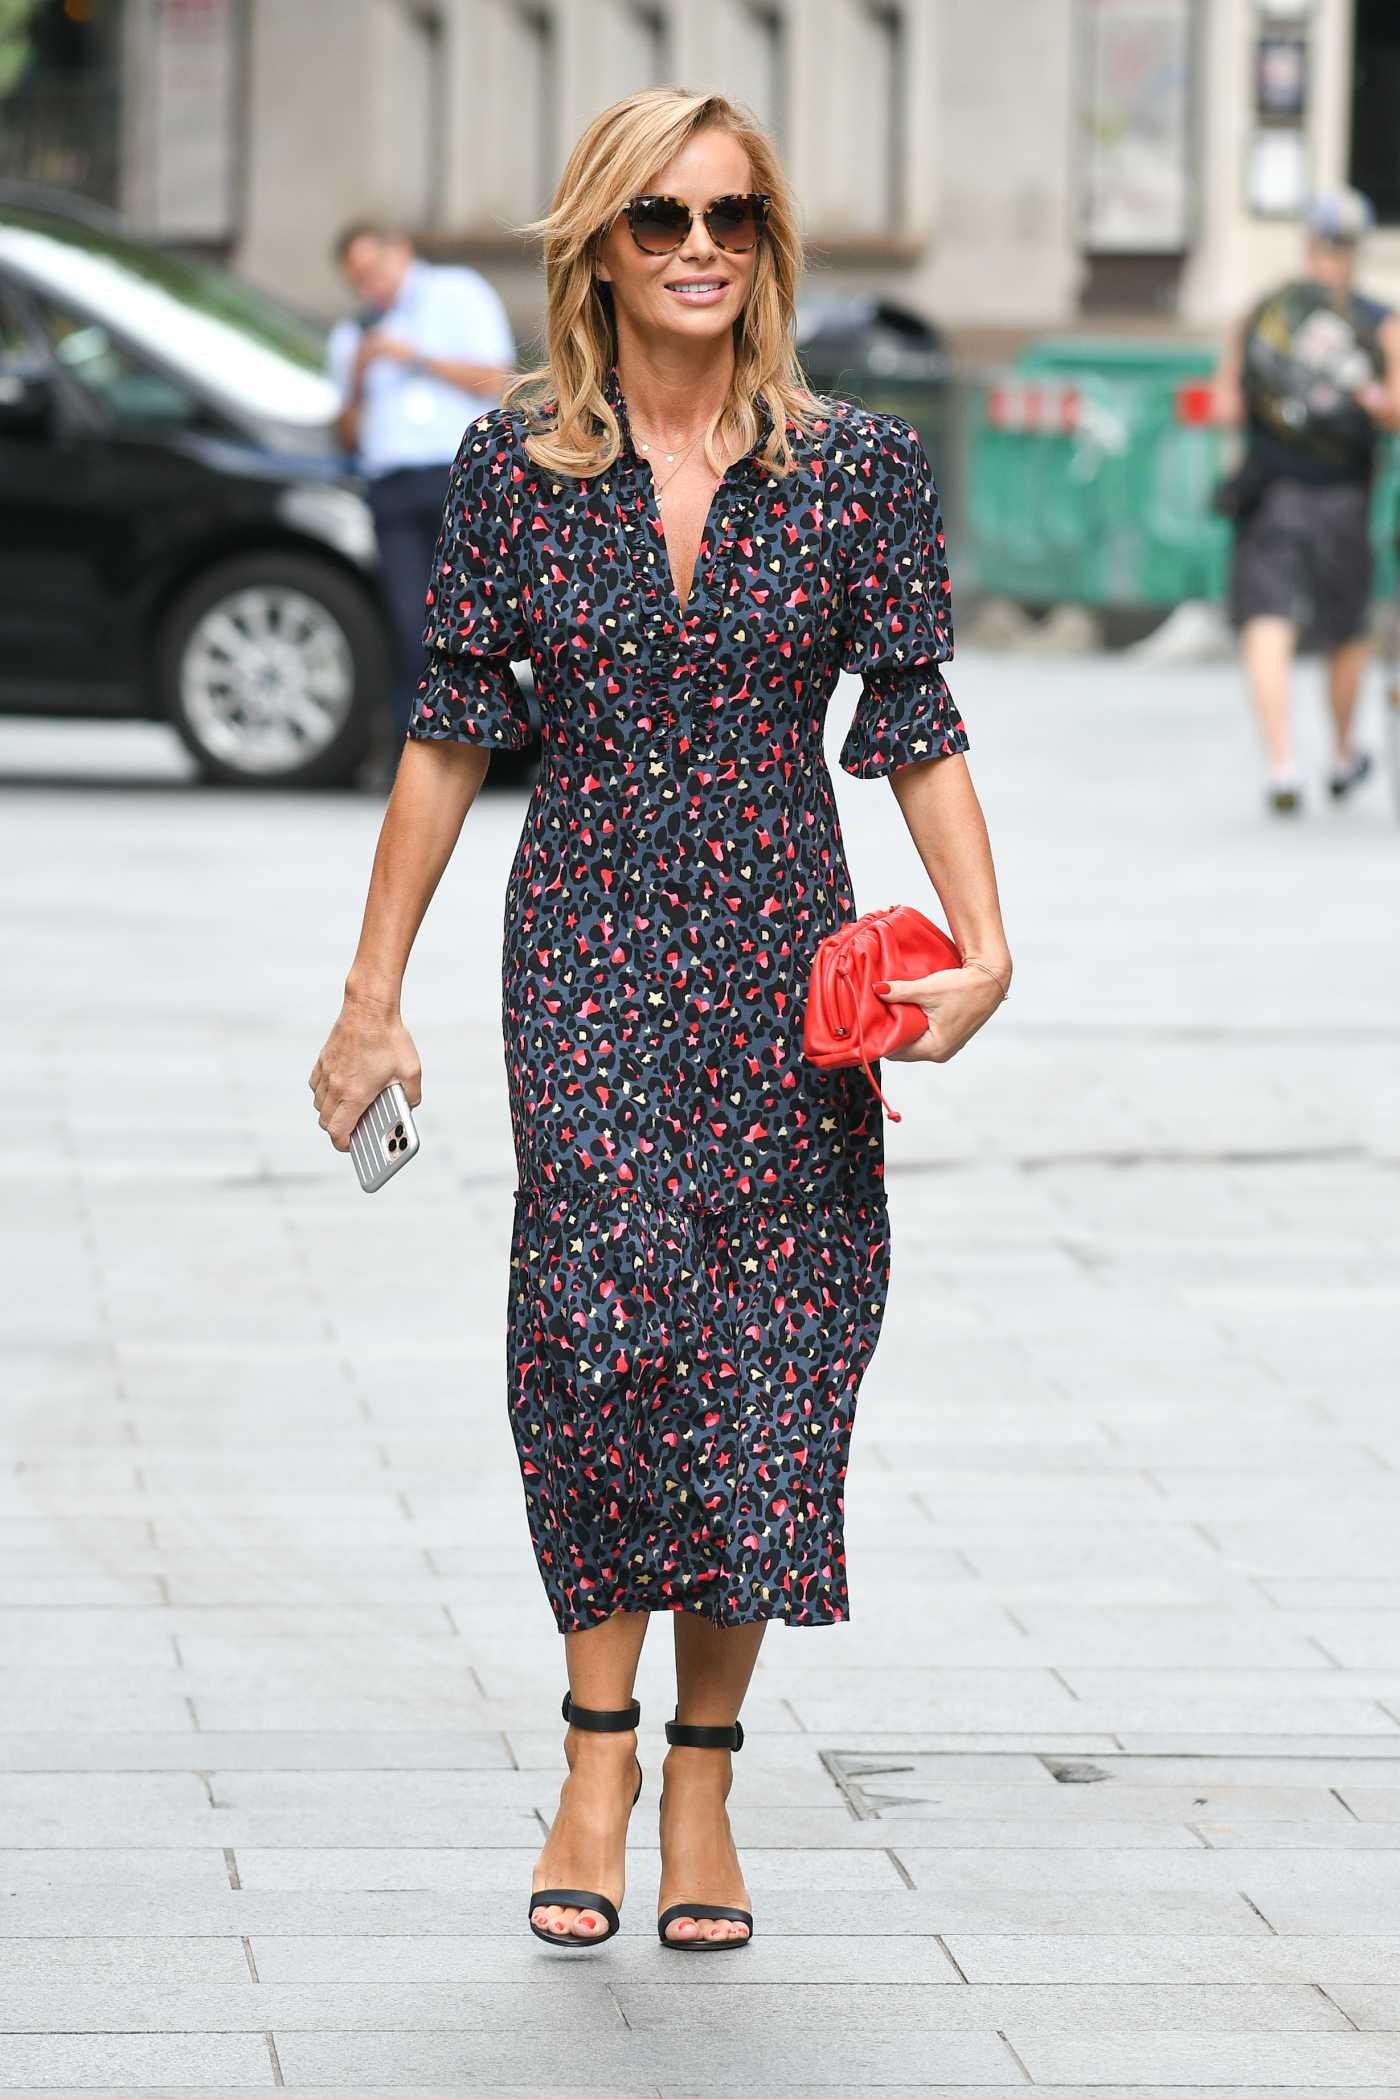 Amanda Holden in a Gray Star Print Dress Leaves the Global Radio Studios in London 07/03/2020